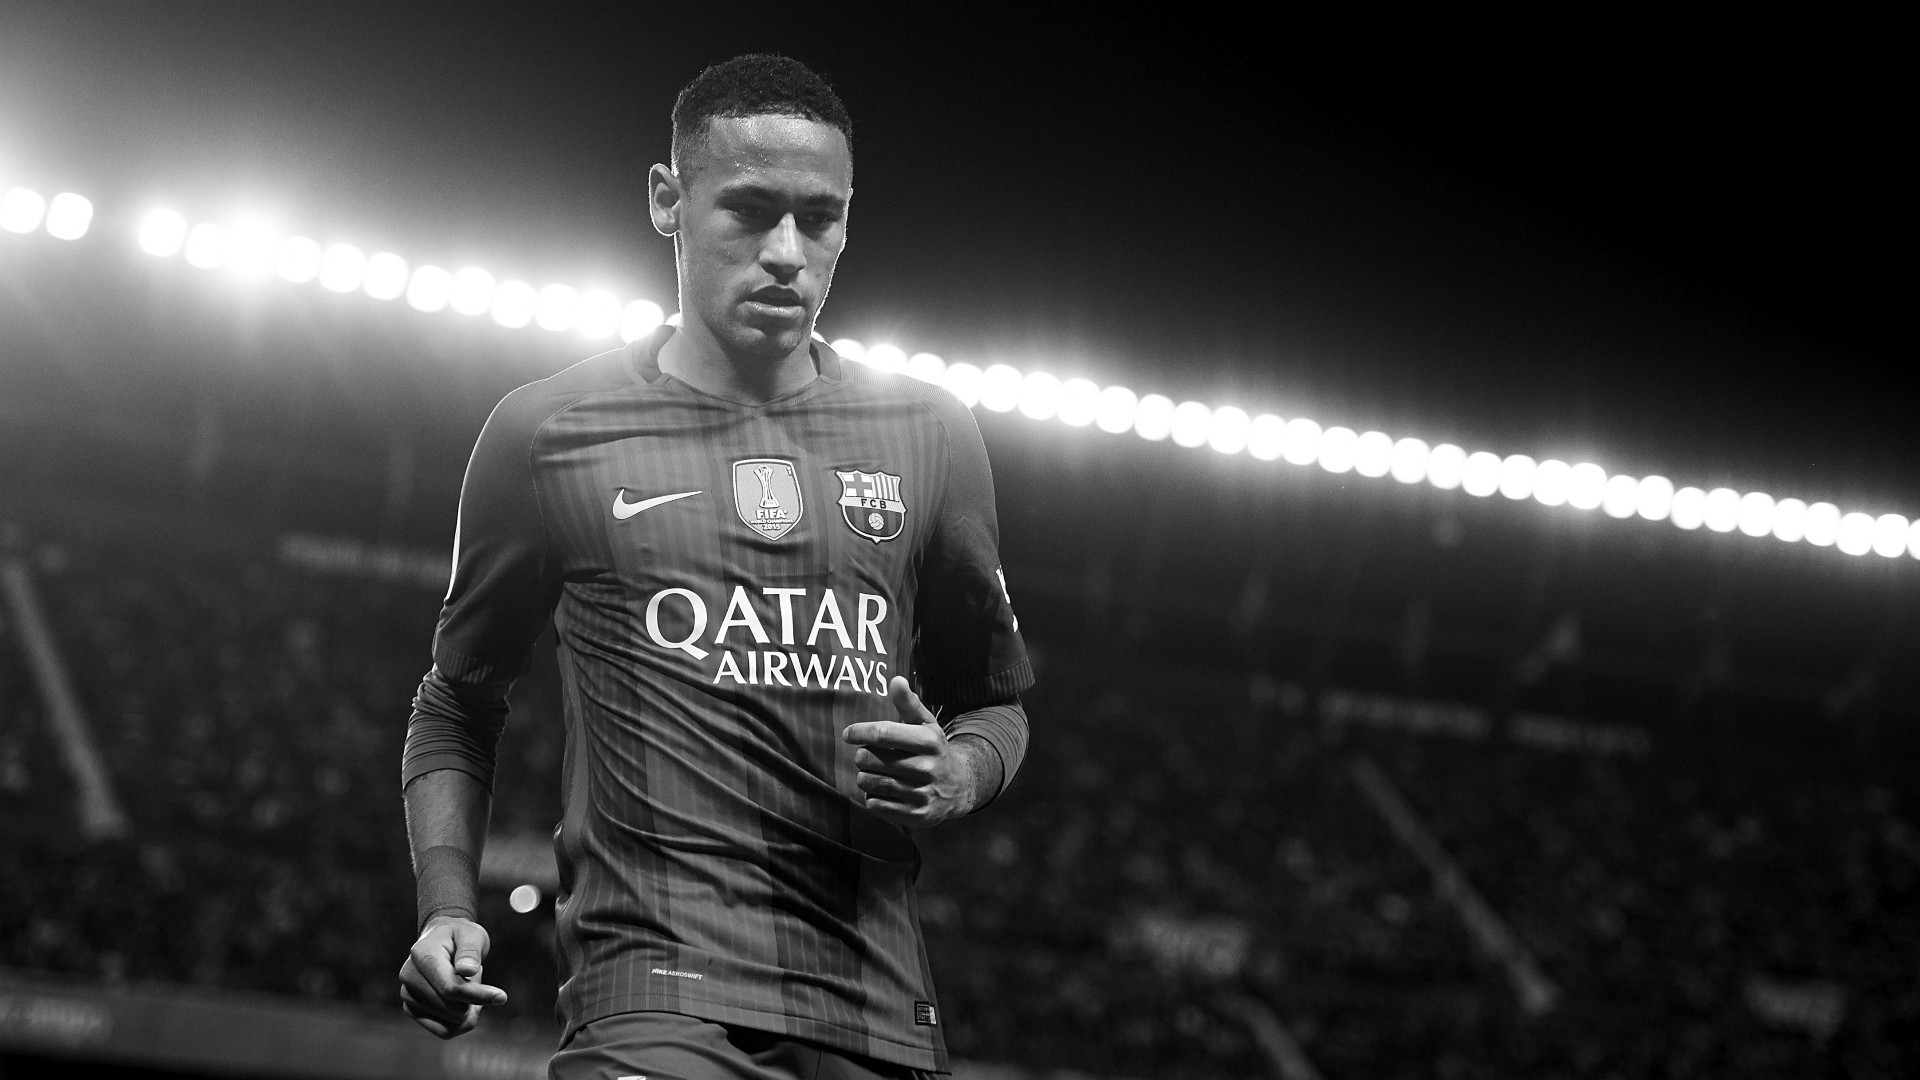 1920x1200 Neymar Barca HD Wallpaper Jr Photo 2017